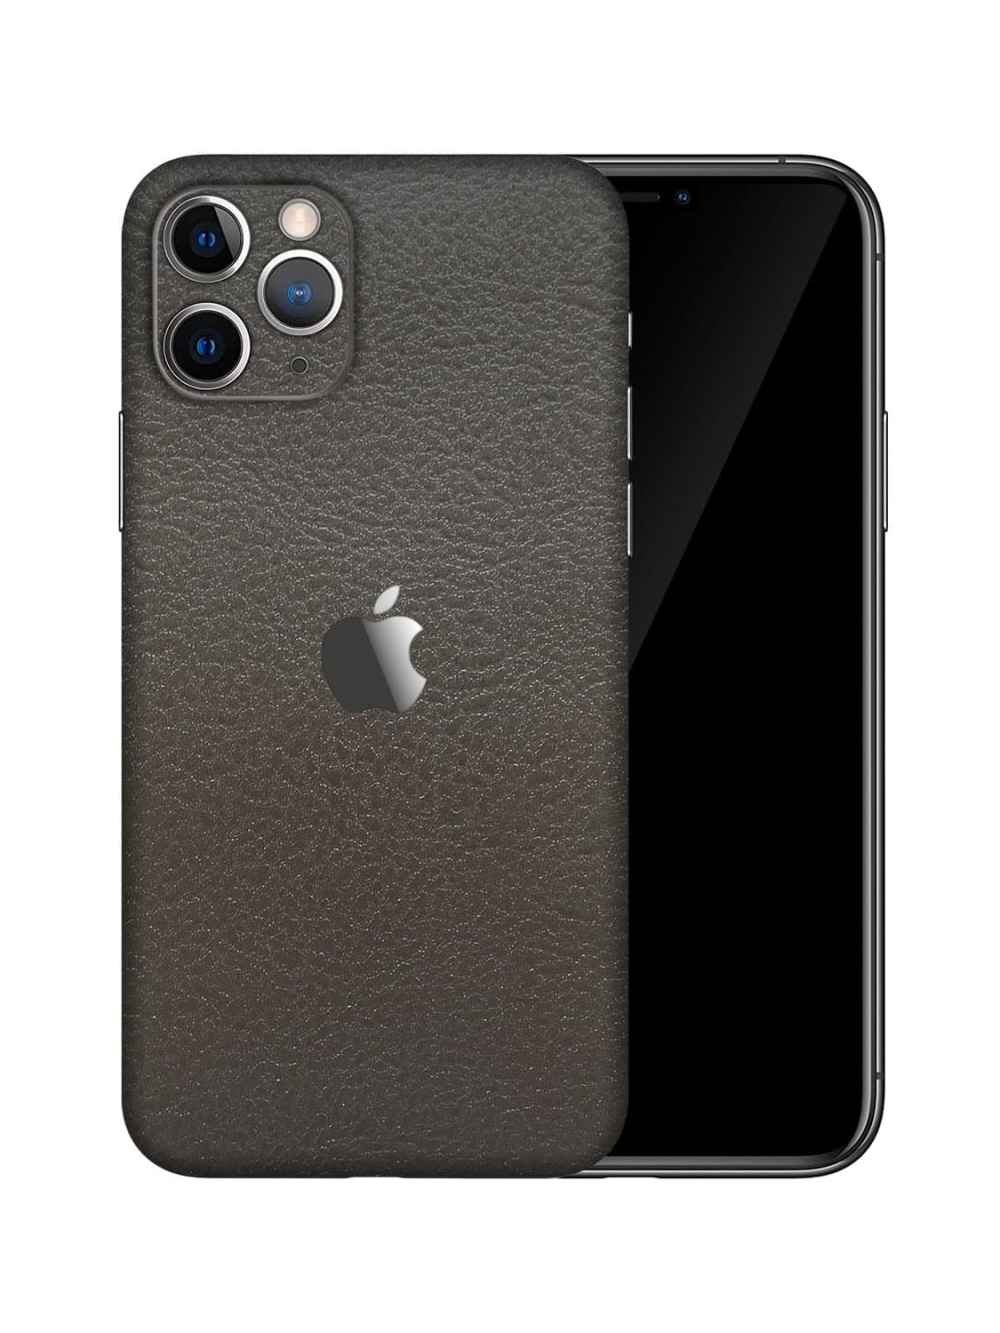 Apple iPhone 11 Pro Max LEATHER Vinyl Skin Wrap